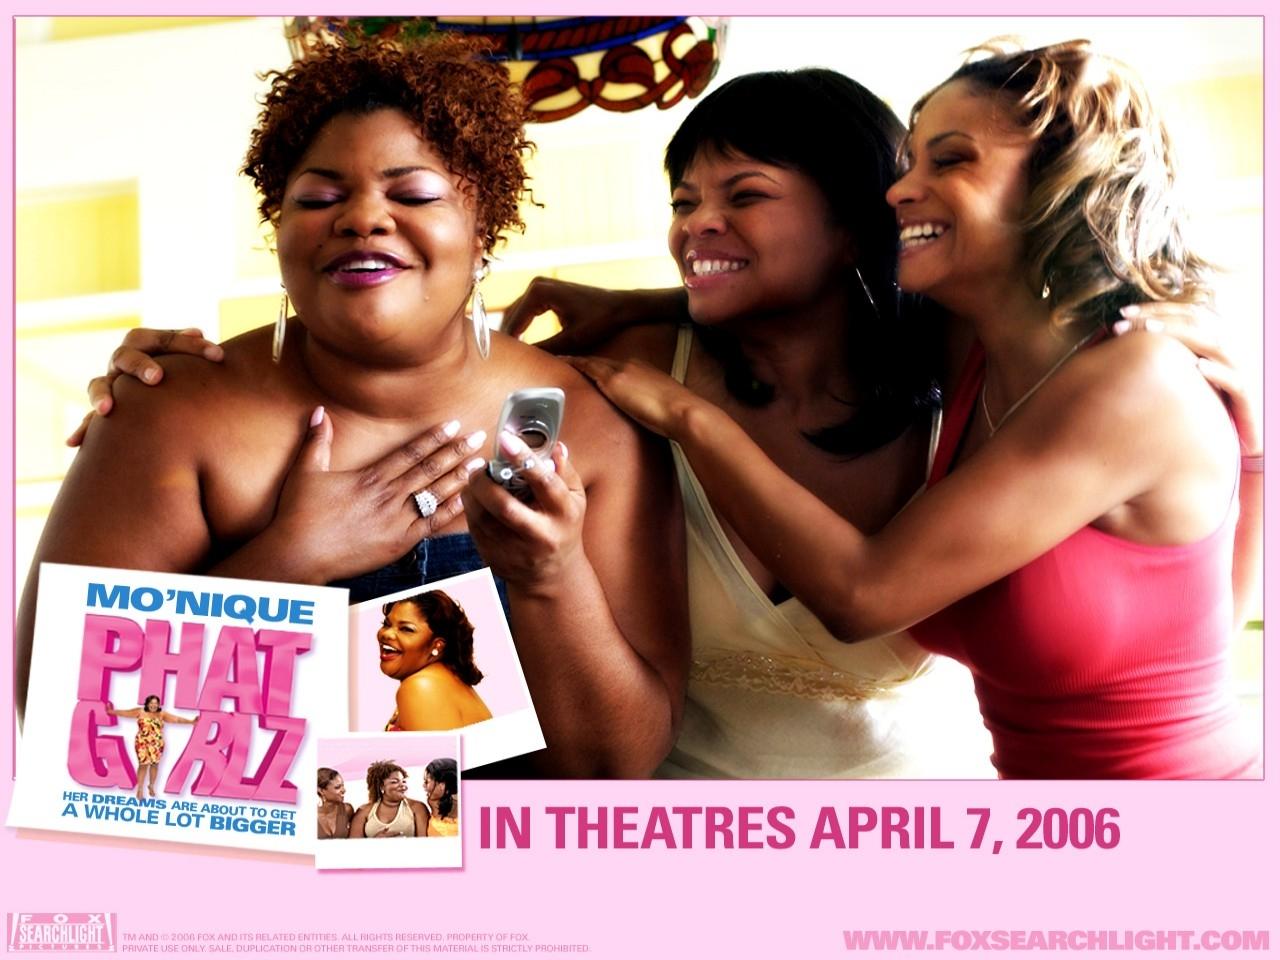 Wallpaper del film Phat Girlz con le burrose protagoniste